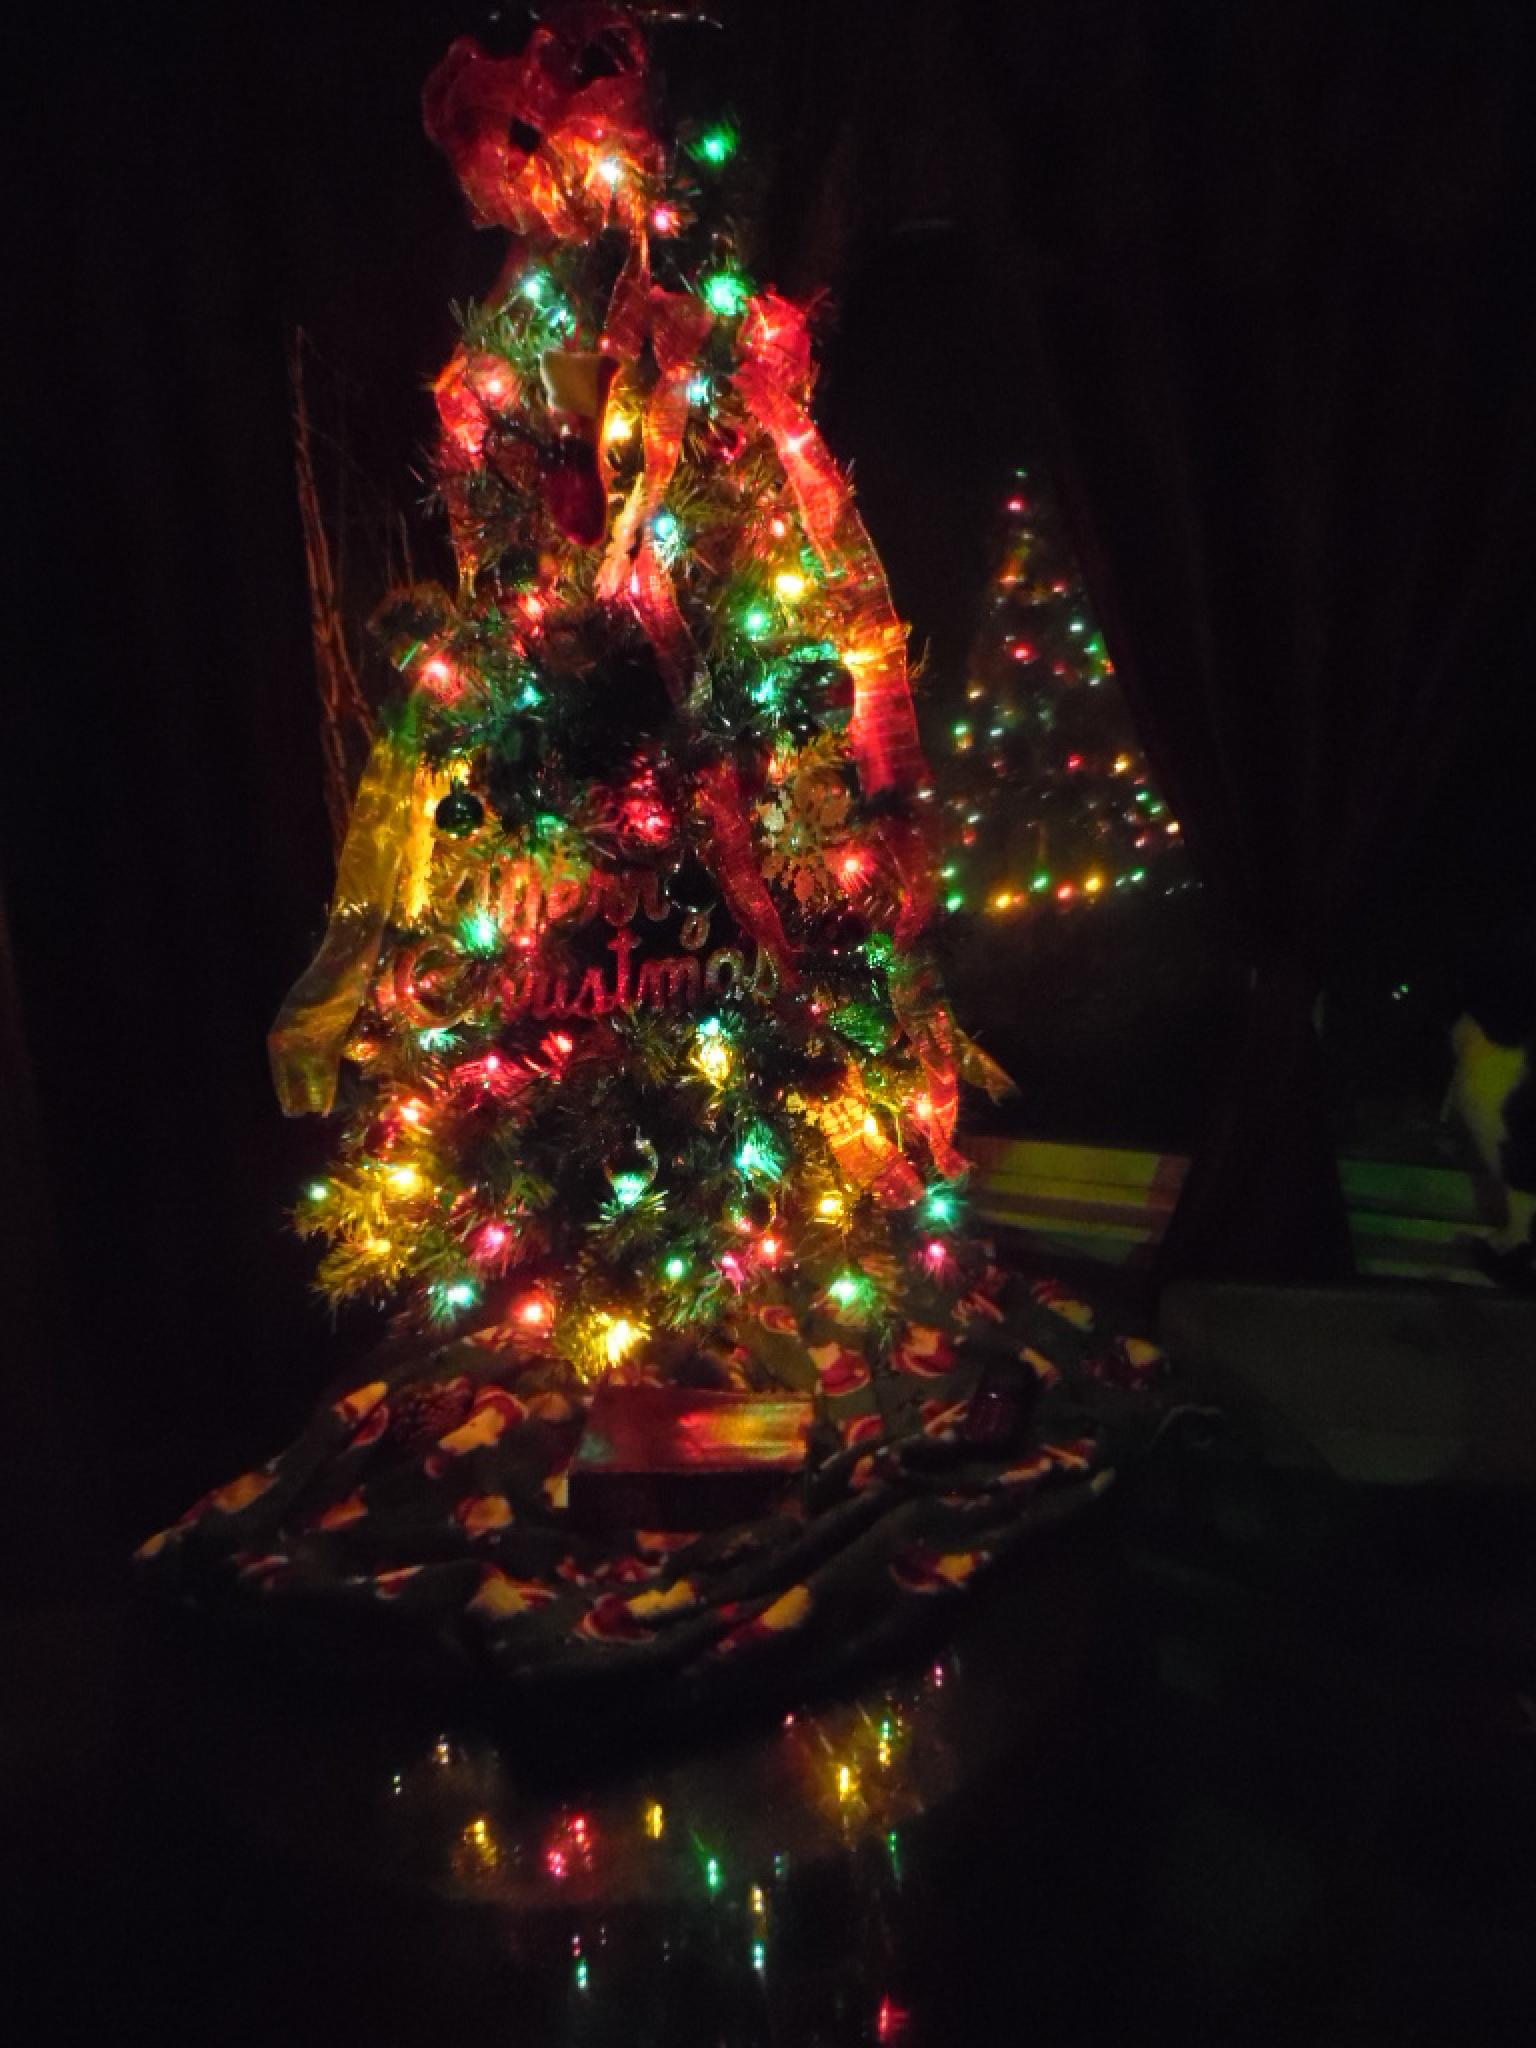 Merry Christmas by hardworkinmom